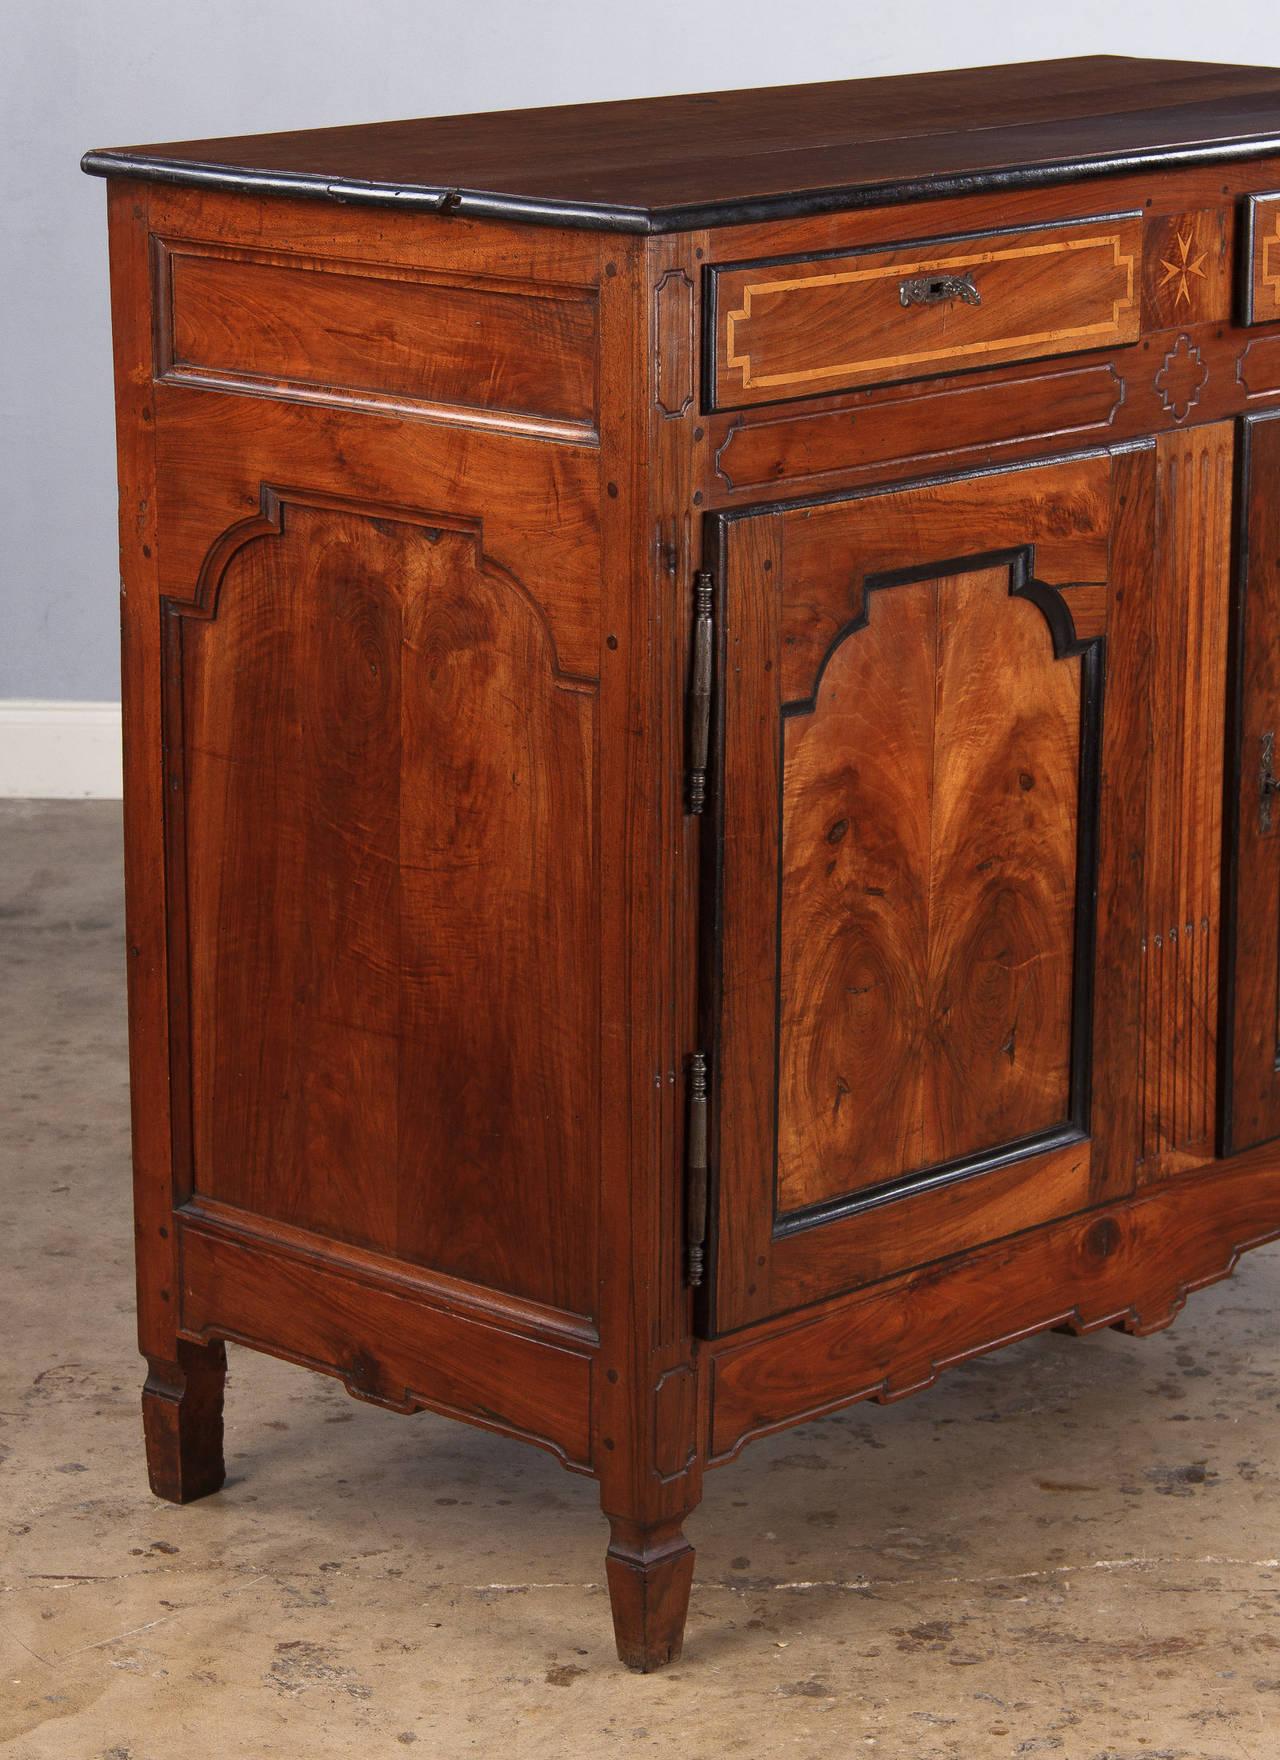 napoleon iii walnut buffet from france 1870s image 3. Black Bedroom Furniture Sets. Home Design Ideas